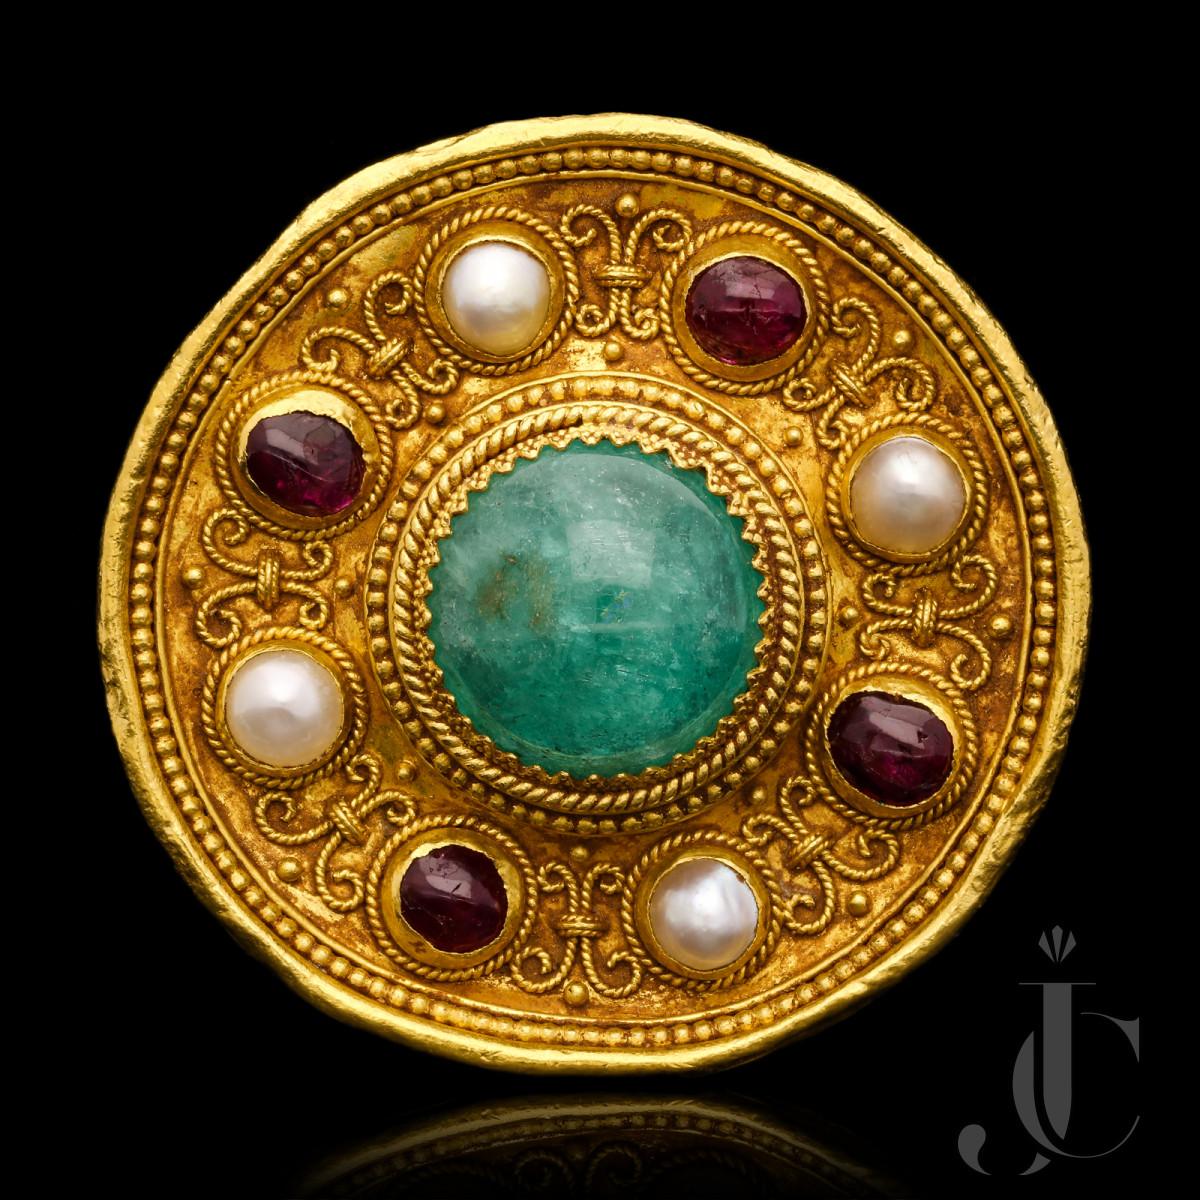 Wiese - Cab. Emerald, Ruby & Nat. Pearl brooch c.1880